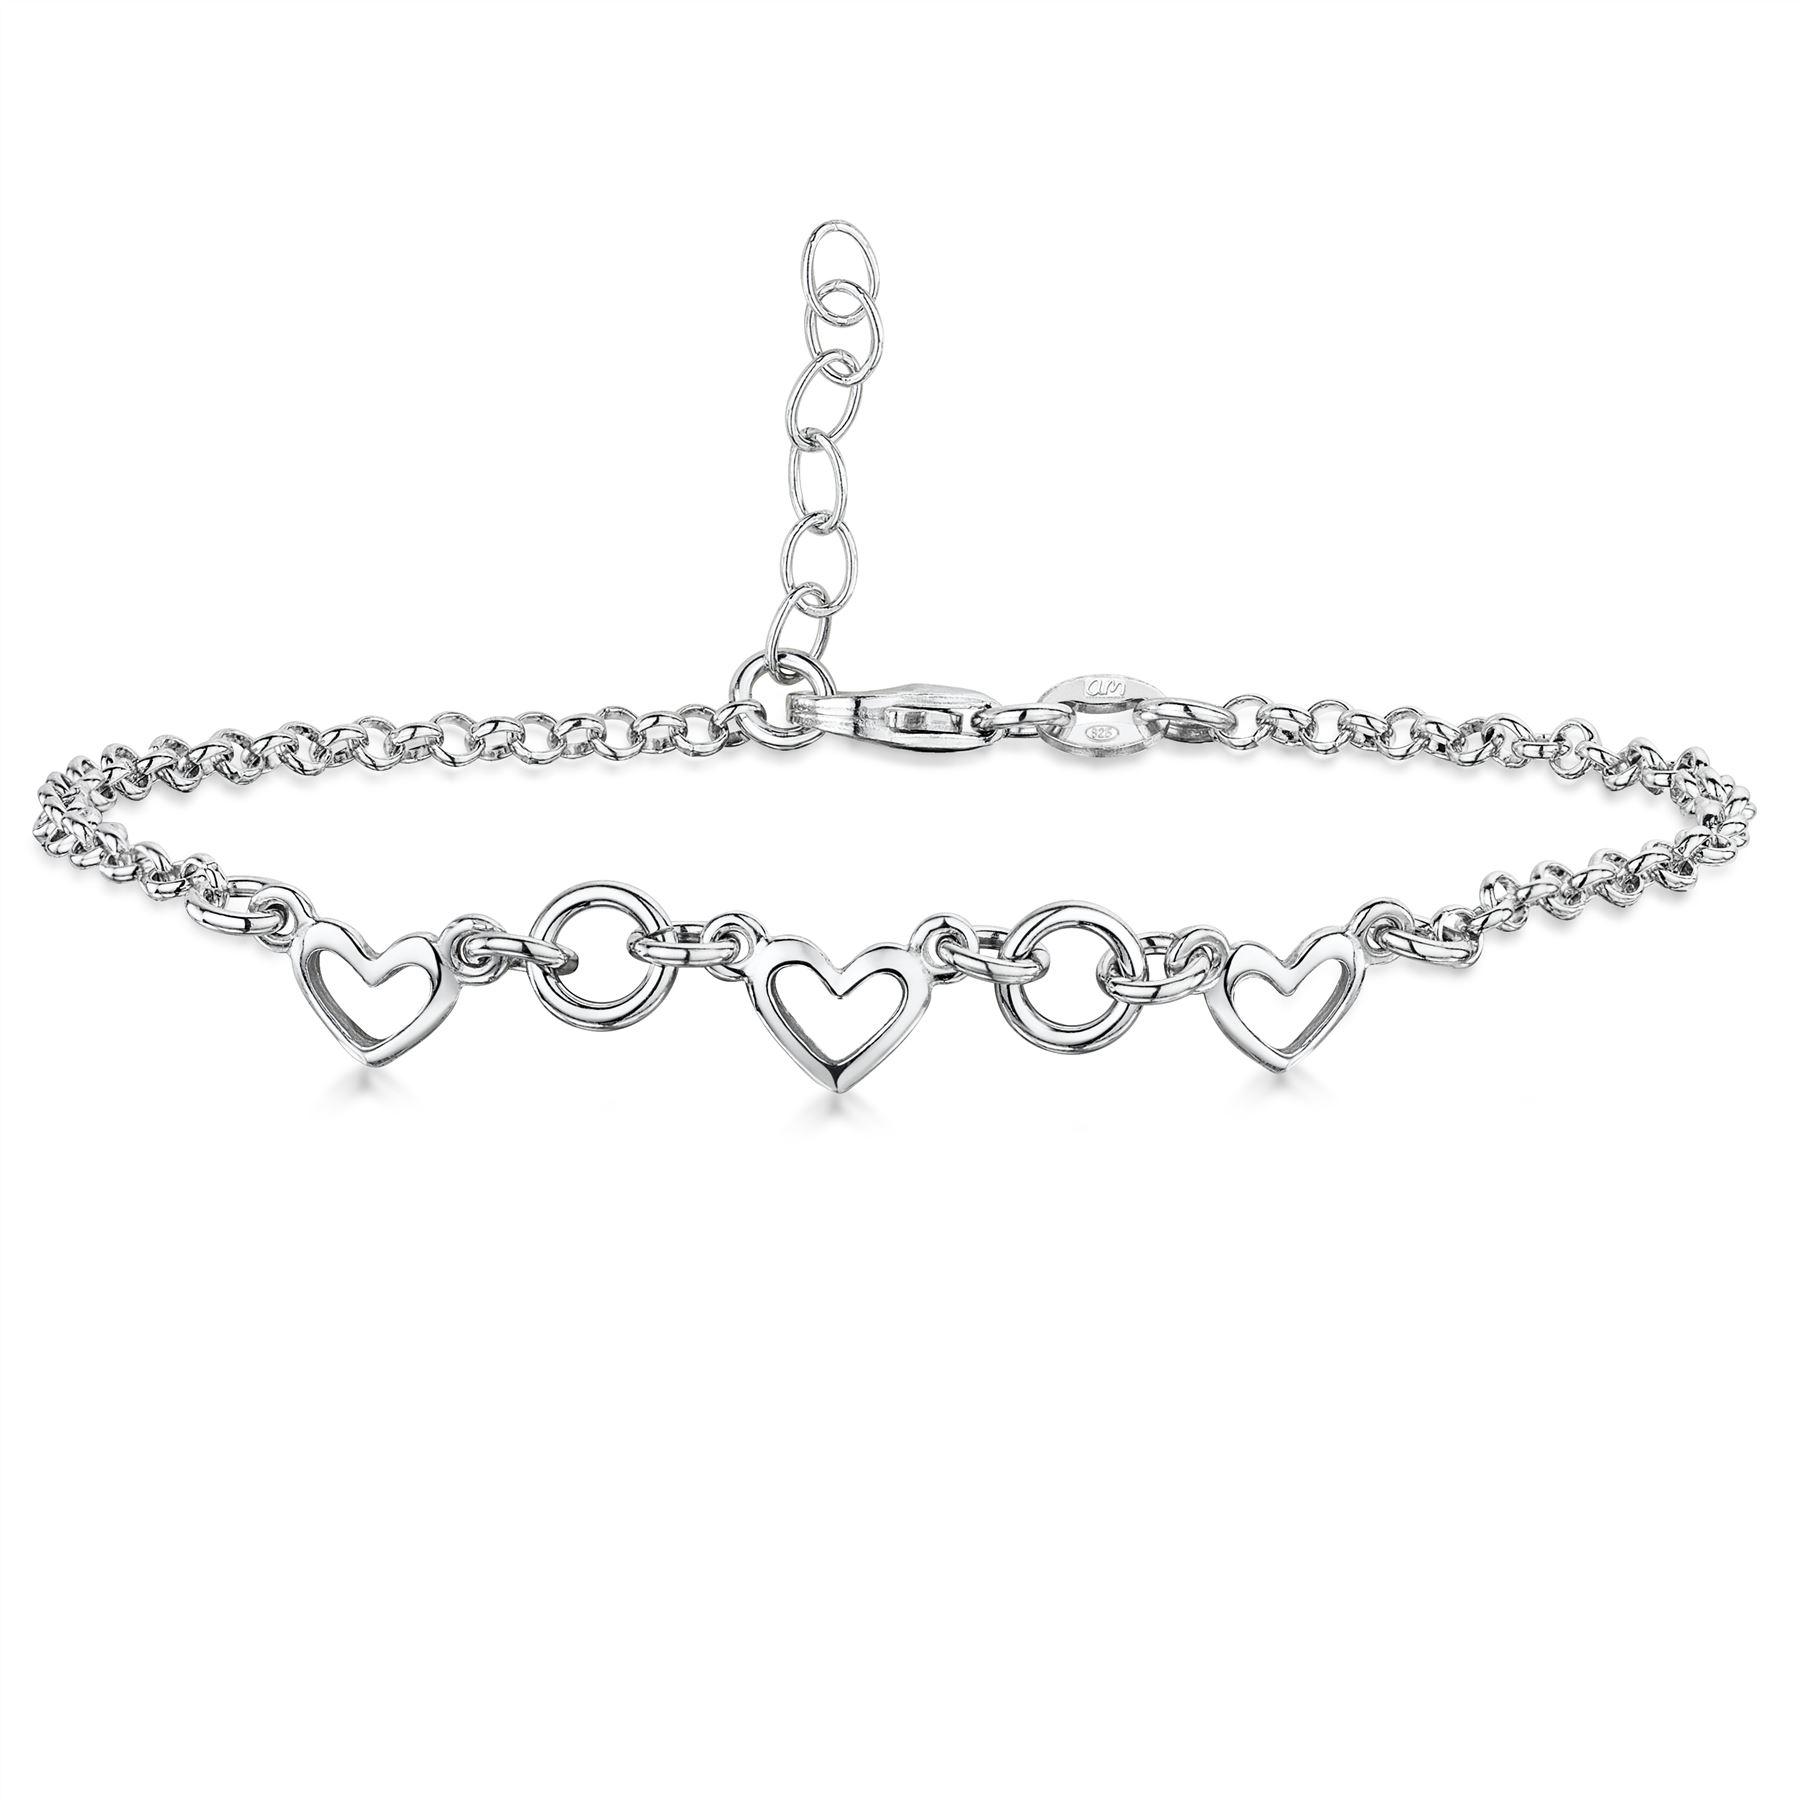 Amberta-Jewelry-925-Sterling-Silver-Adjustable-Bracelet-Italian-Bangle-for-Women thumbnail 63